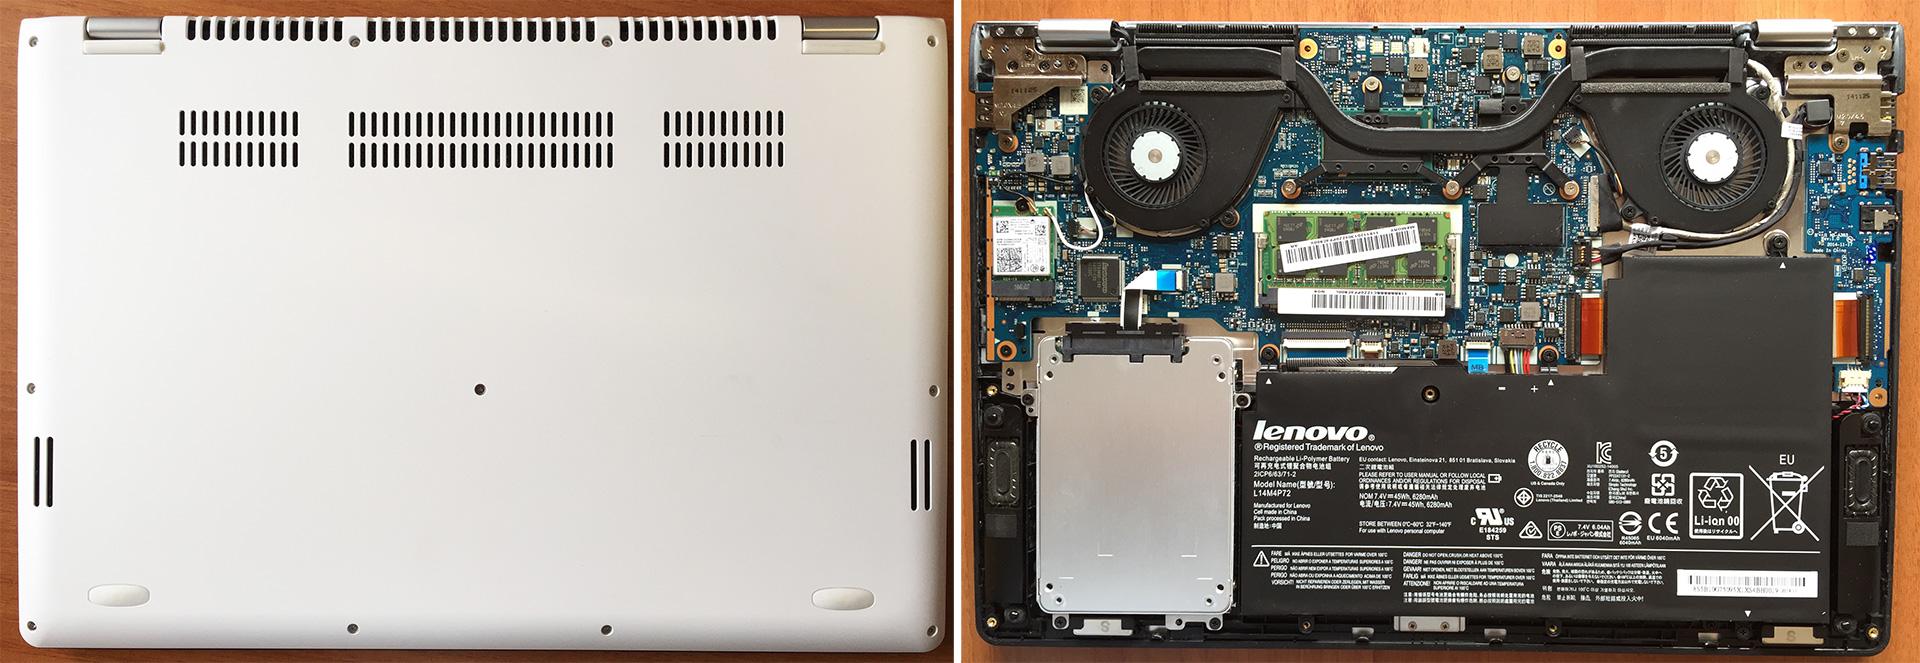 Inside Lenovo Yoga 3 (14-inch) – disassembly, internal